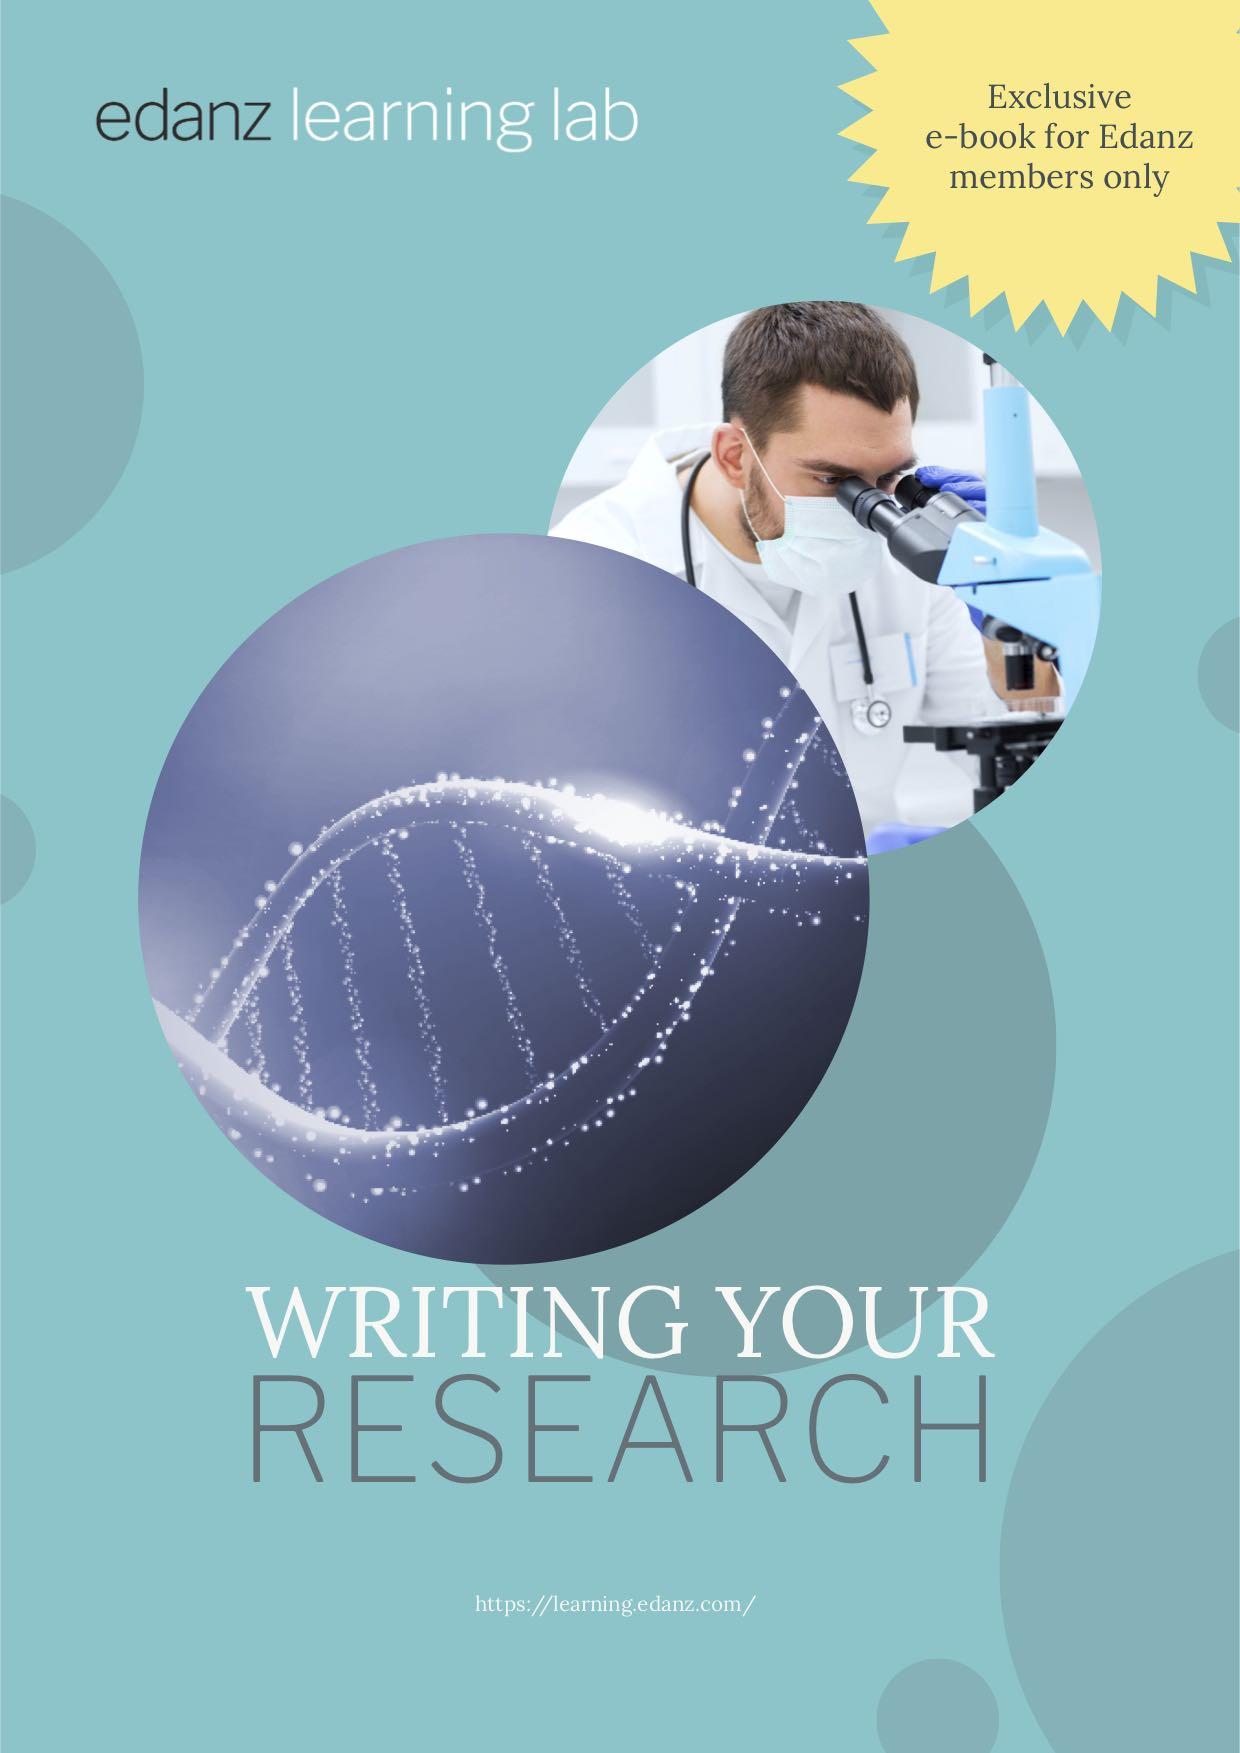 Edanz_eBook_Writing-Your-Research_English